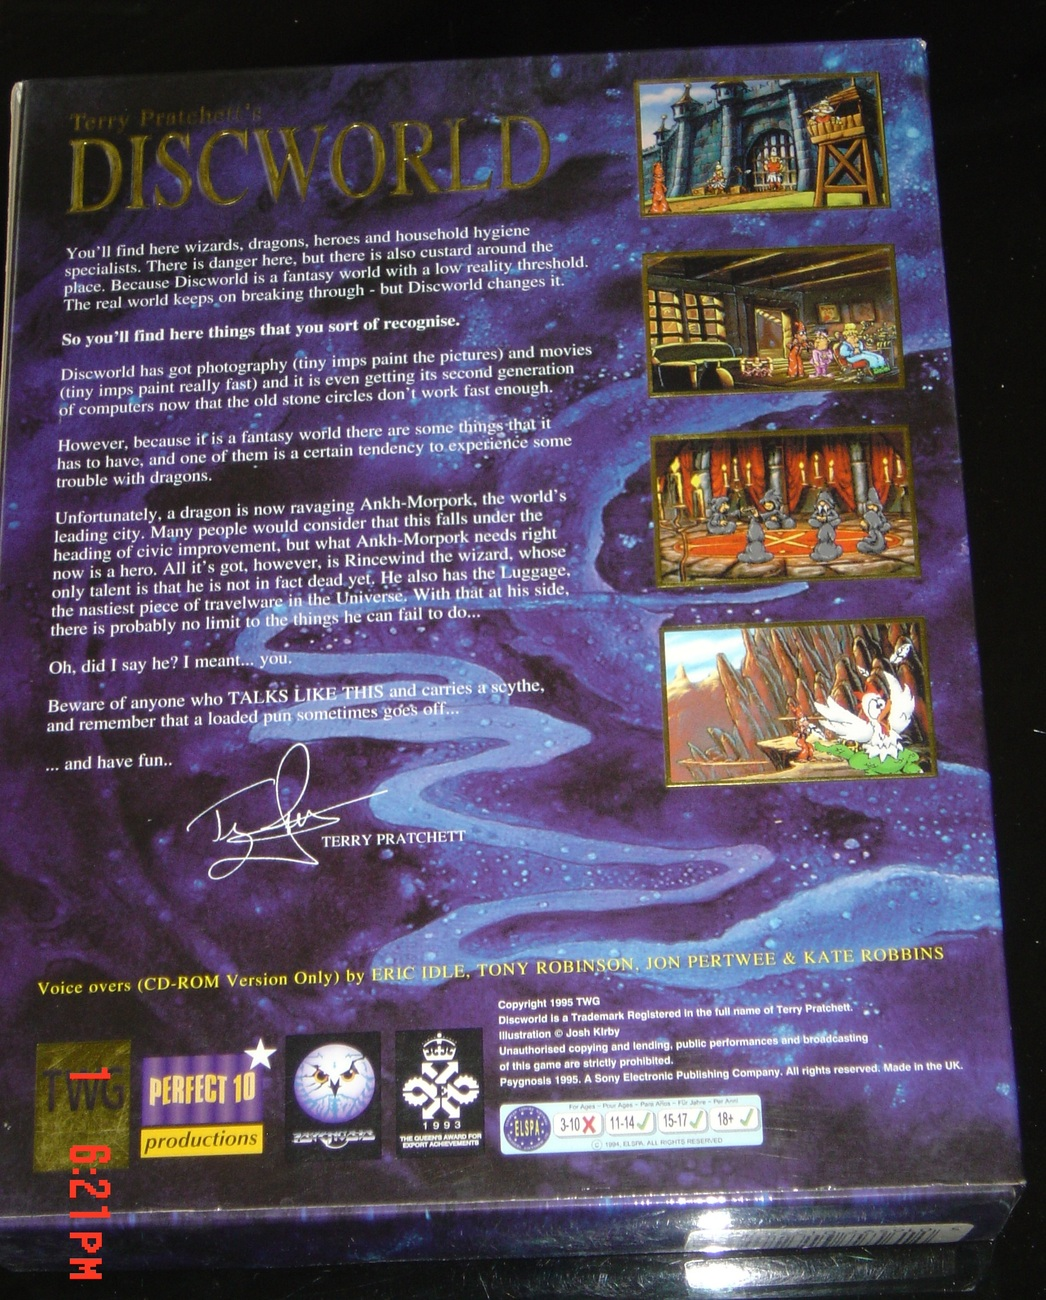 DISCWORLD RARE BIG BOX EDITION